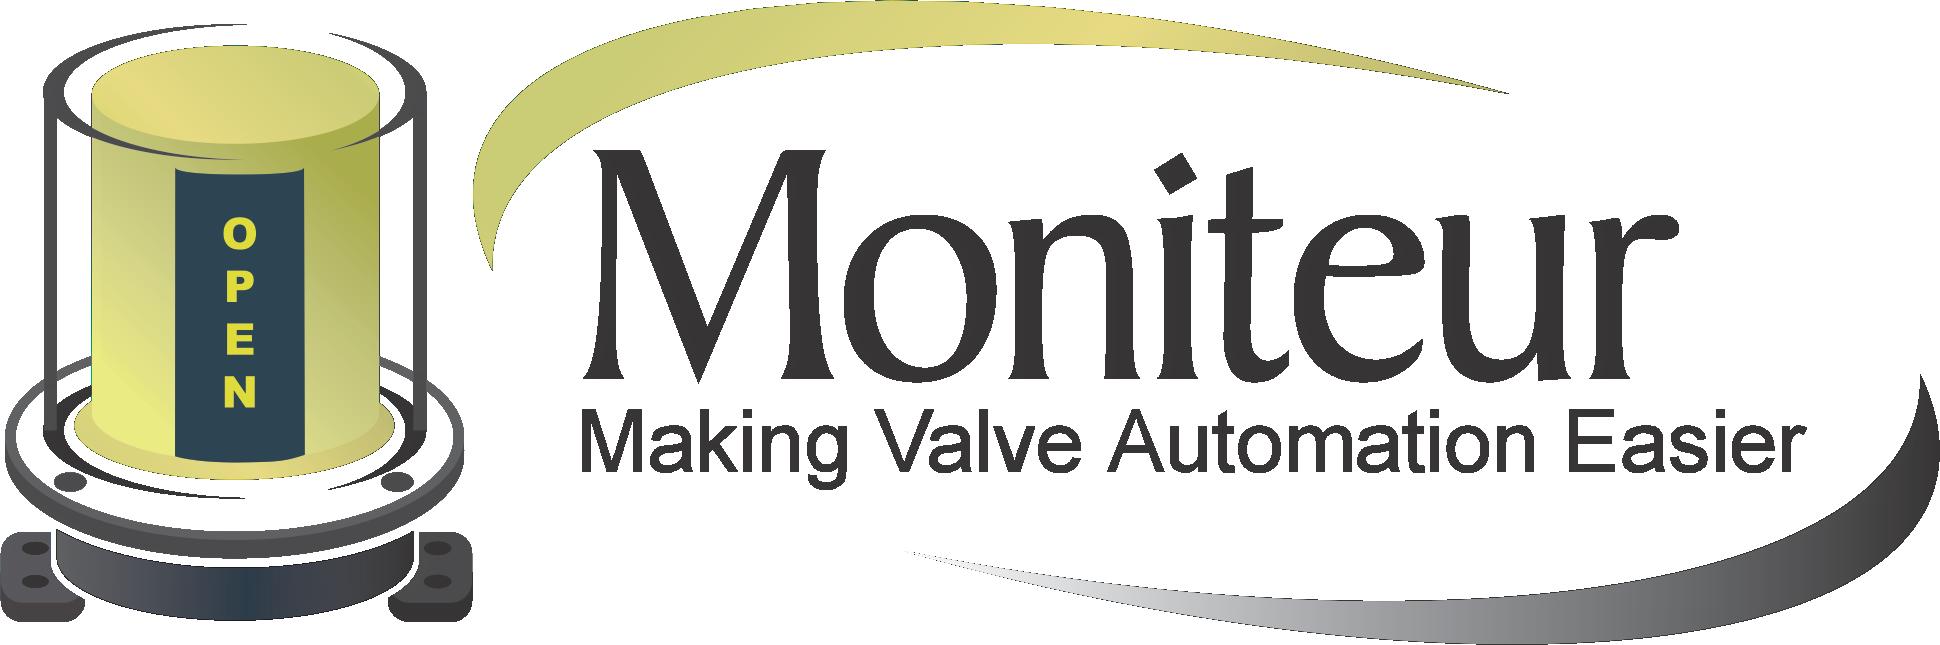 Moniteur Logo